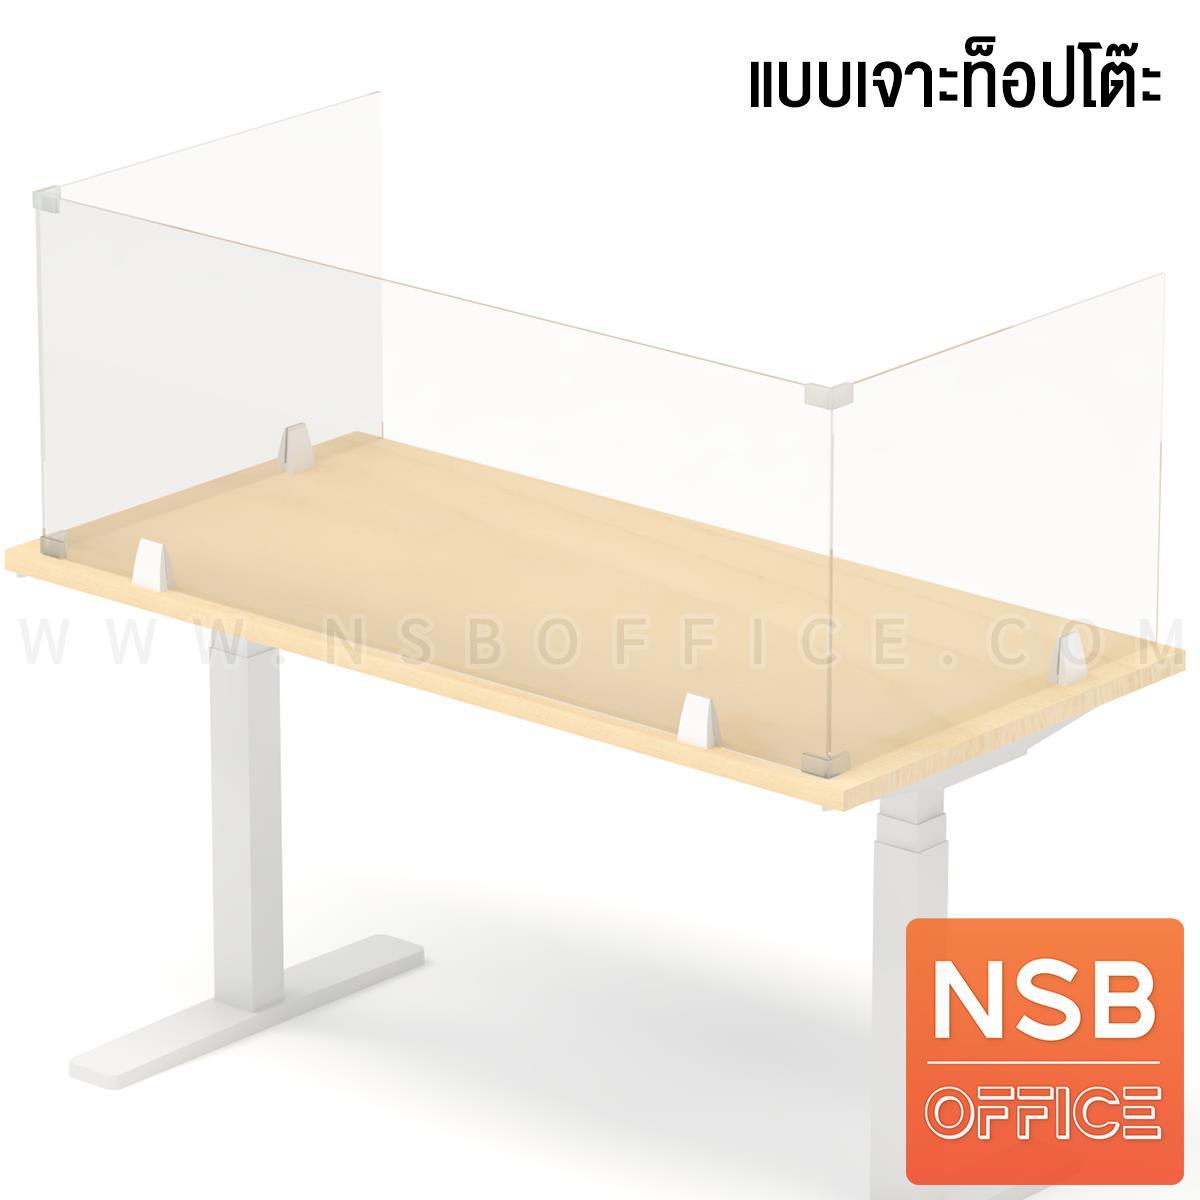 P04A054:ชุดมินิสกรีนอะคลีลิค วางครอบโต๊ะ รุ่น Jubilie (จูบิลี่) สูง 45 ซม. เจาะหน้าโต๊ะพร้อมคลิบล็อกมุมฉาก